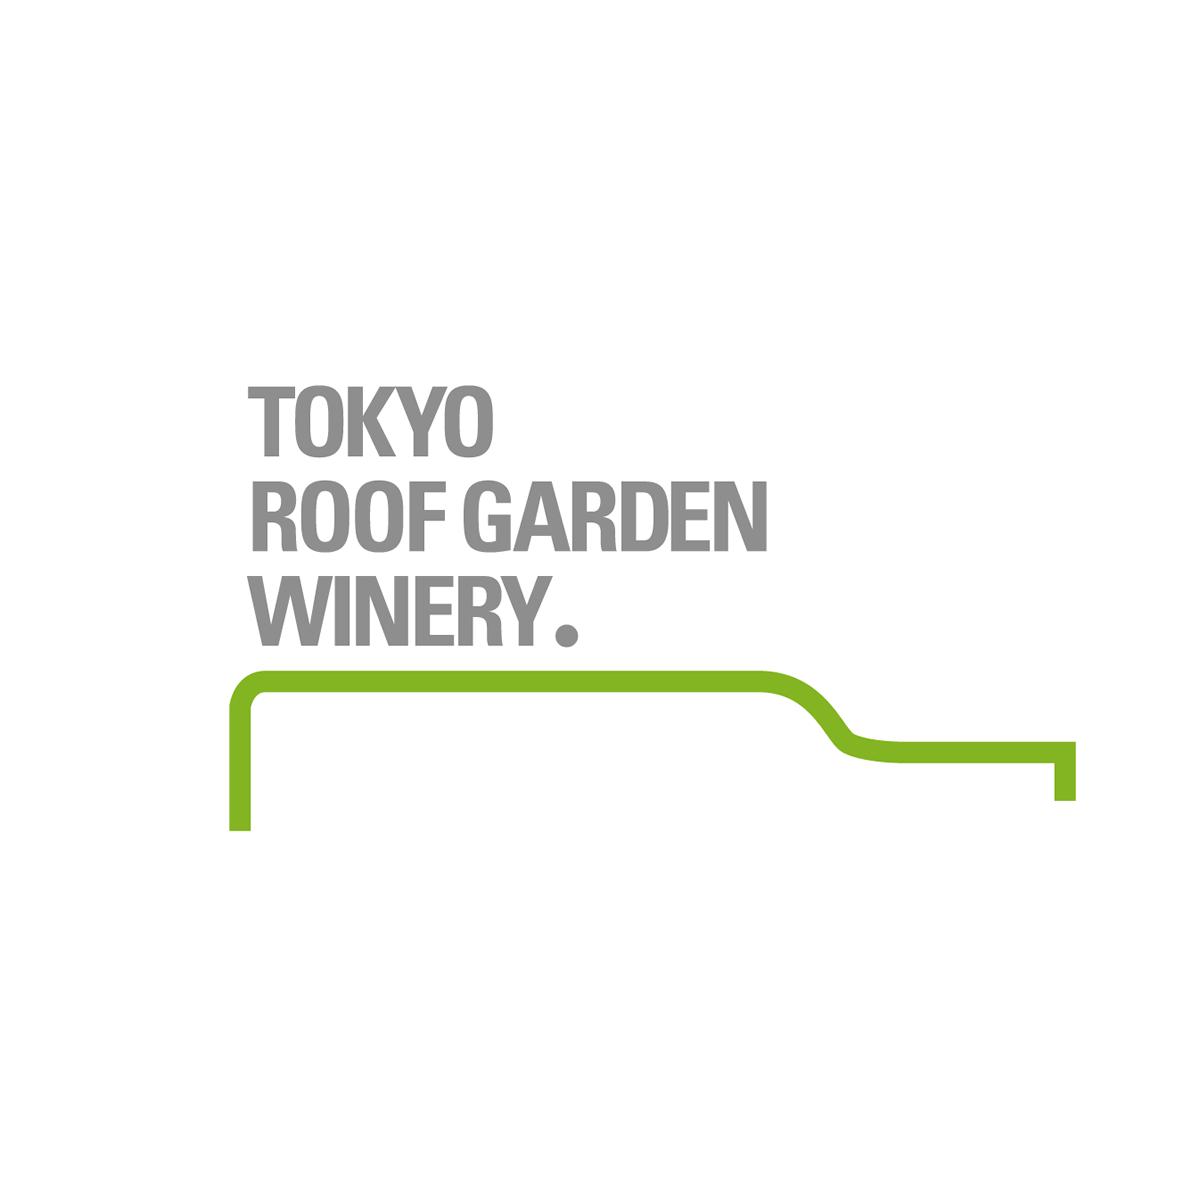 Wel's|Tokyo Roof Garden Winery 東京屋上ワイナリー計画| VIロゴデザイン|東京都千代田区